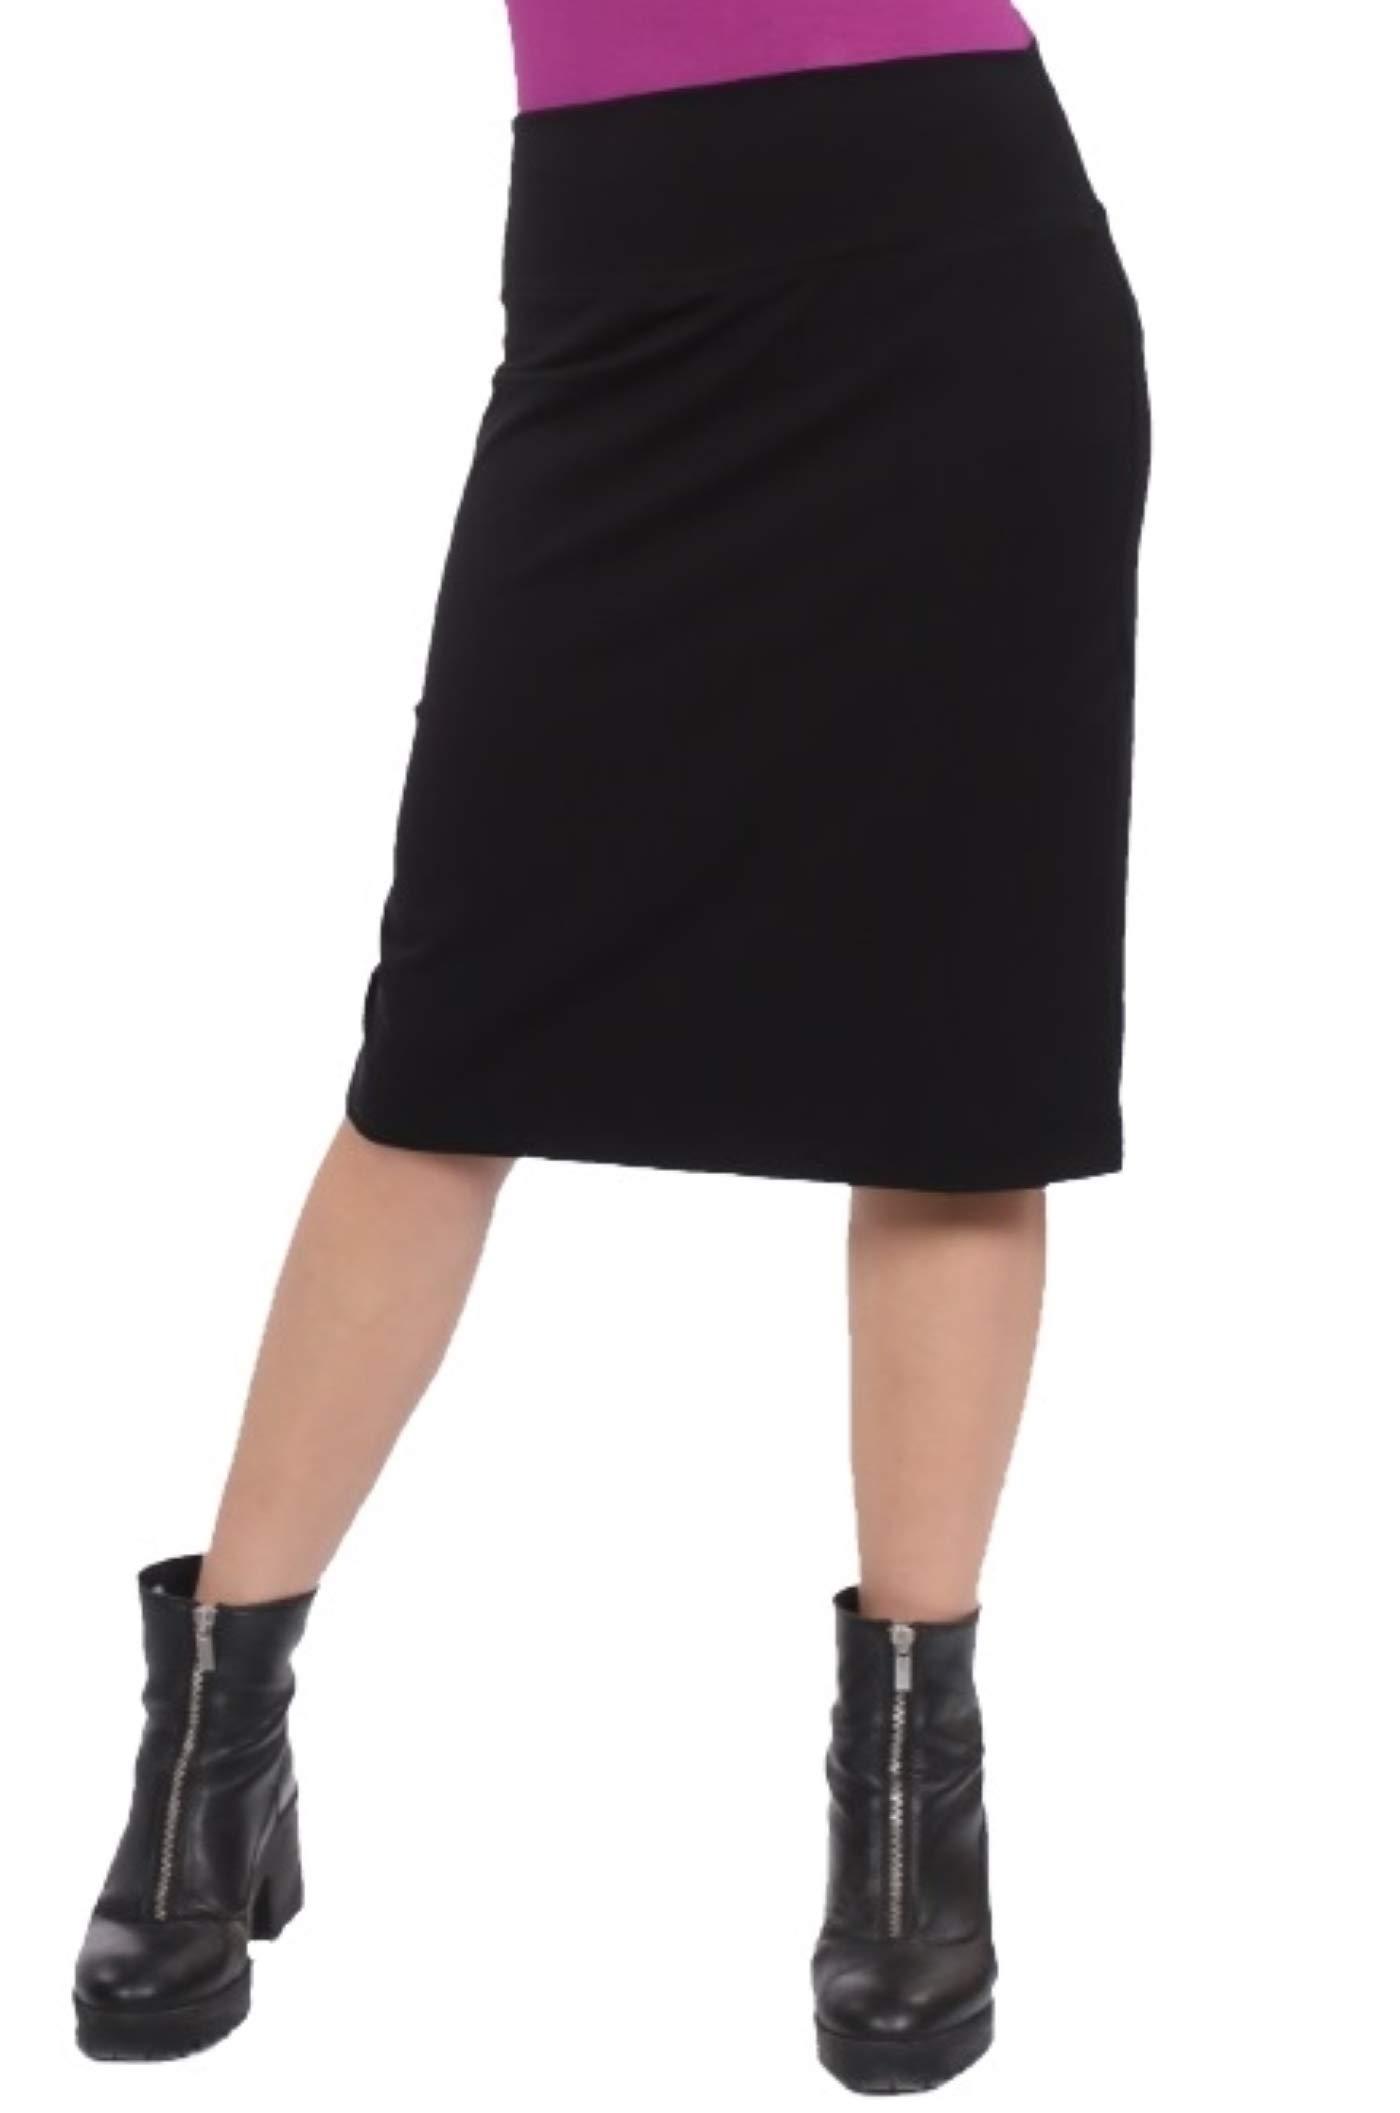 Kosher Casual Women's Modest Knee Length Stretch Pencil Skirt in Lightweight Cotton Lycra